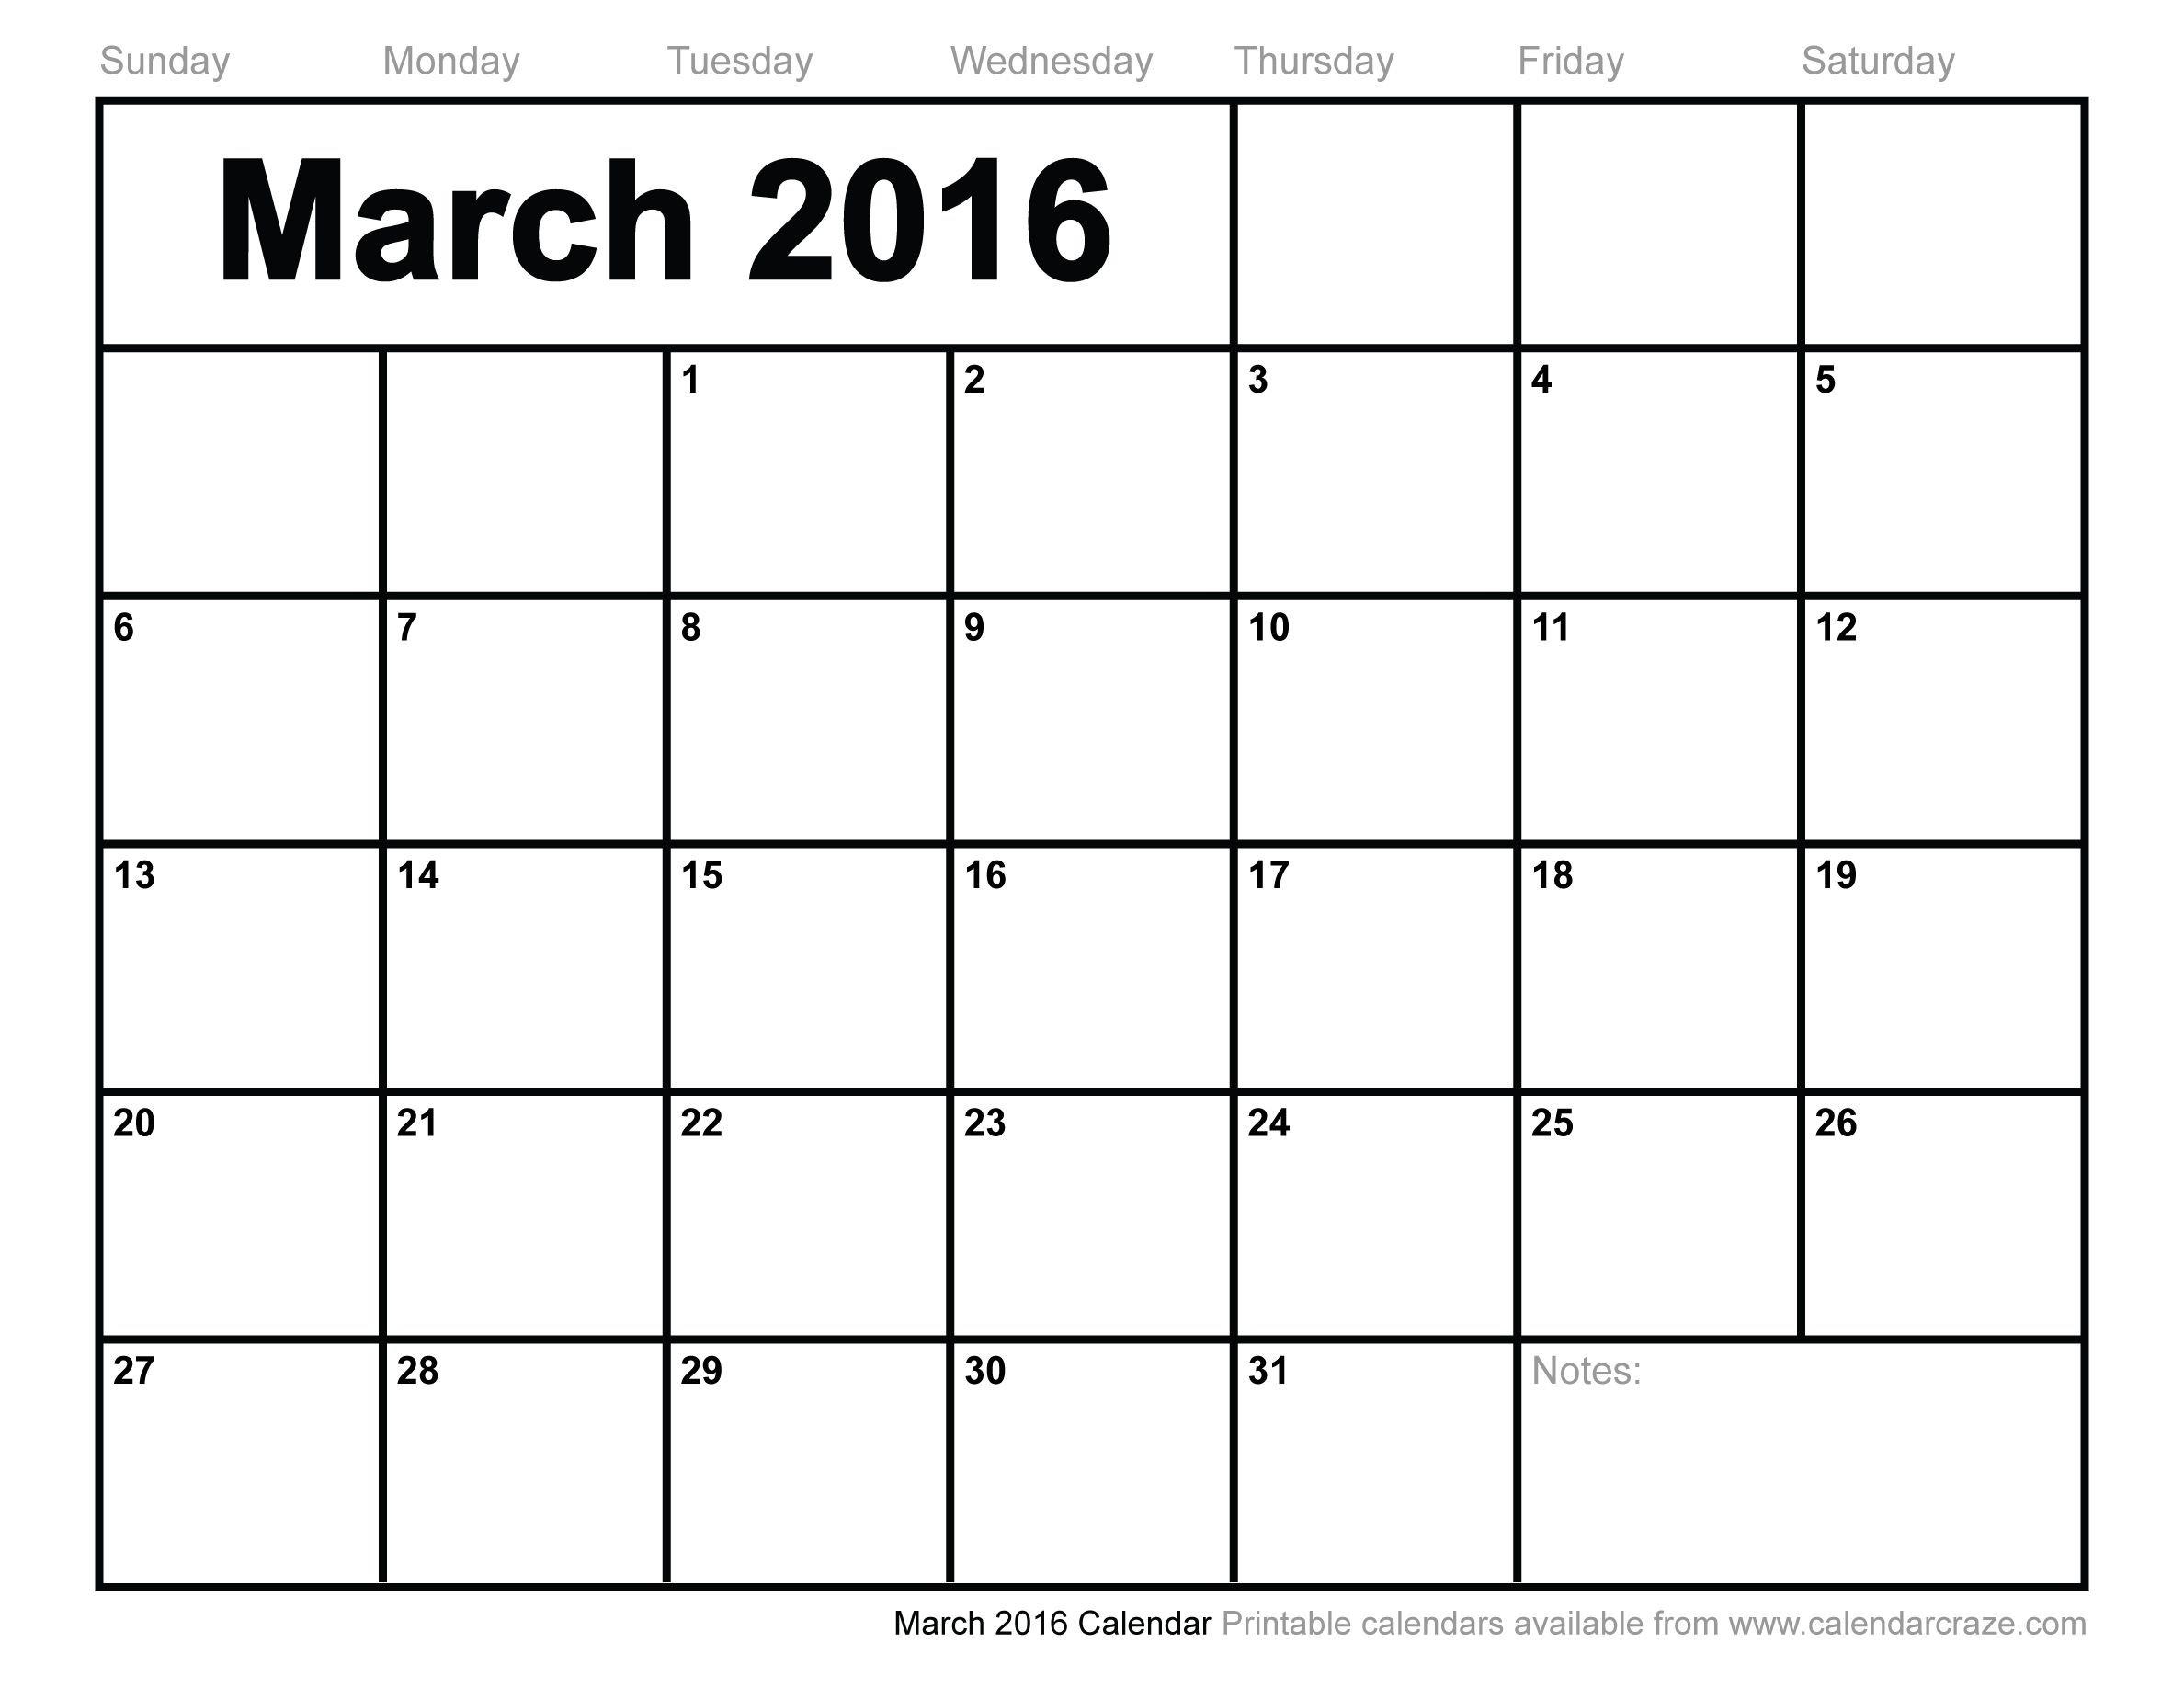 Mar 2016 Calendar Printable Pdf - Google Search Blank Calendars To Fill In Online